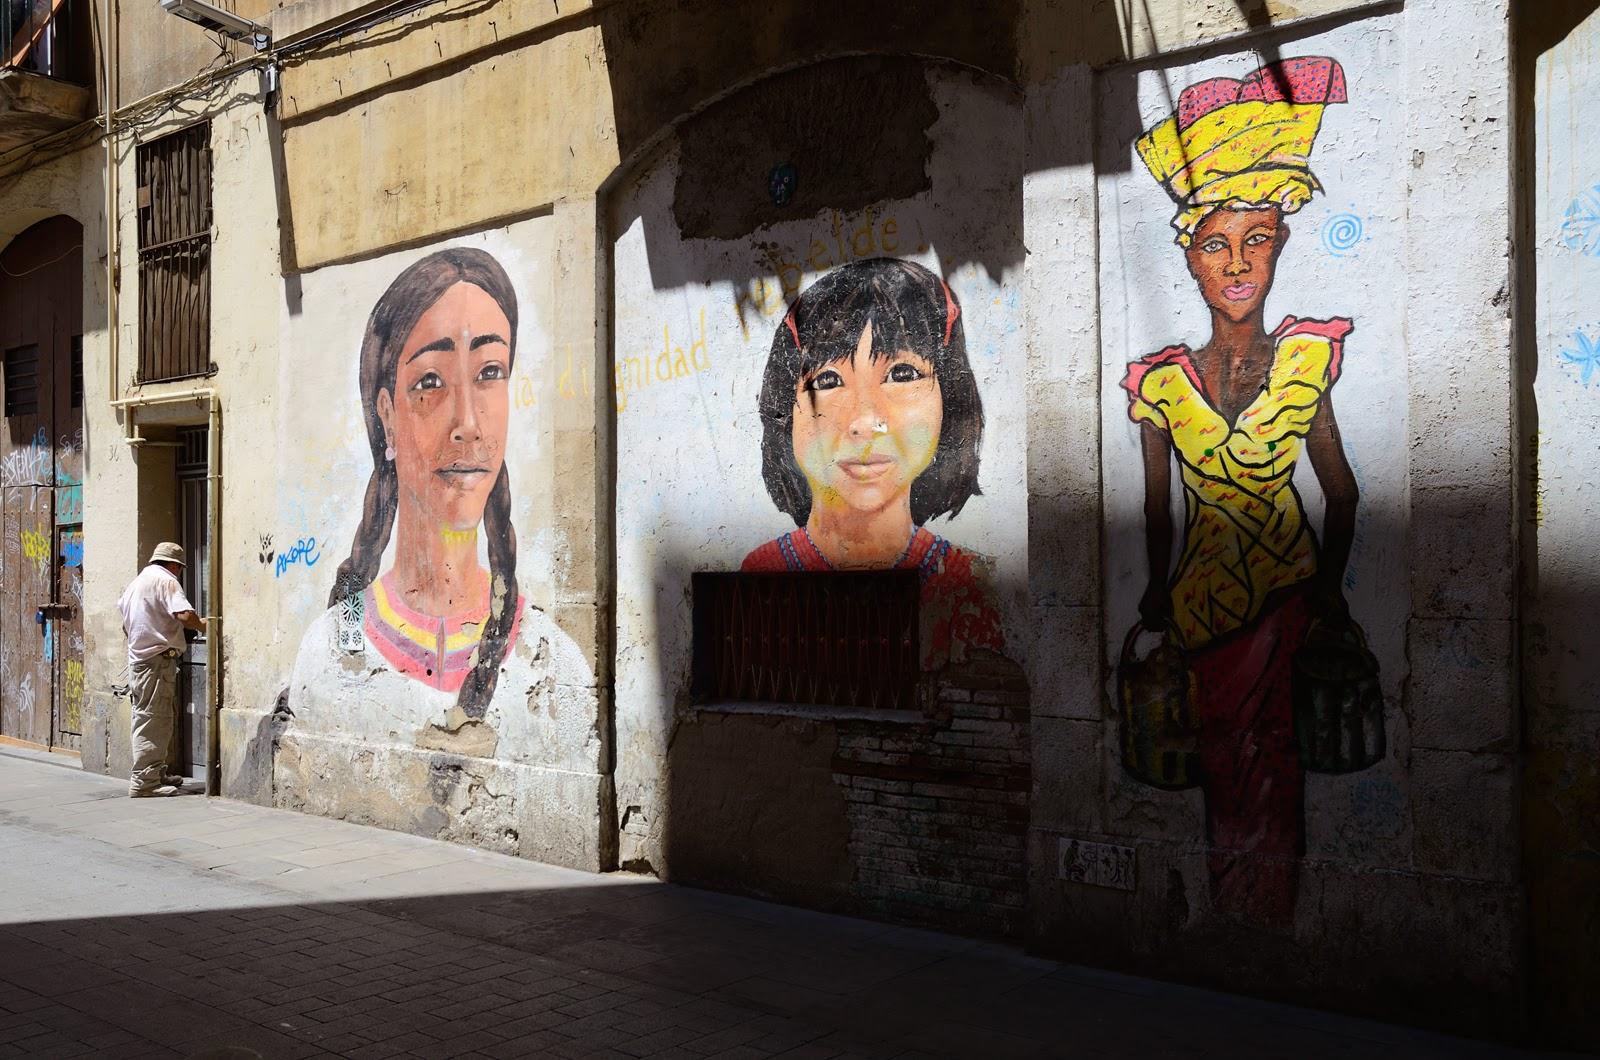 Ethnic mural in Barcelona